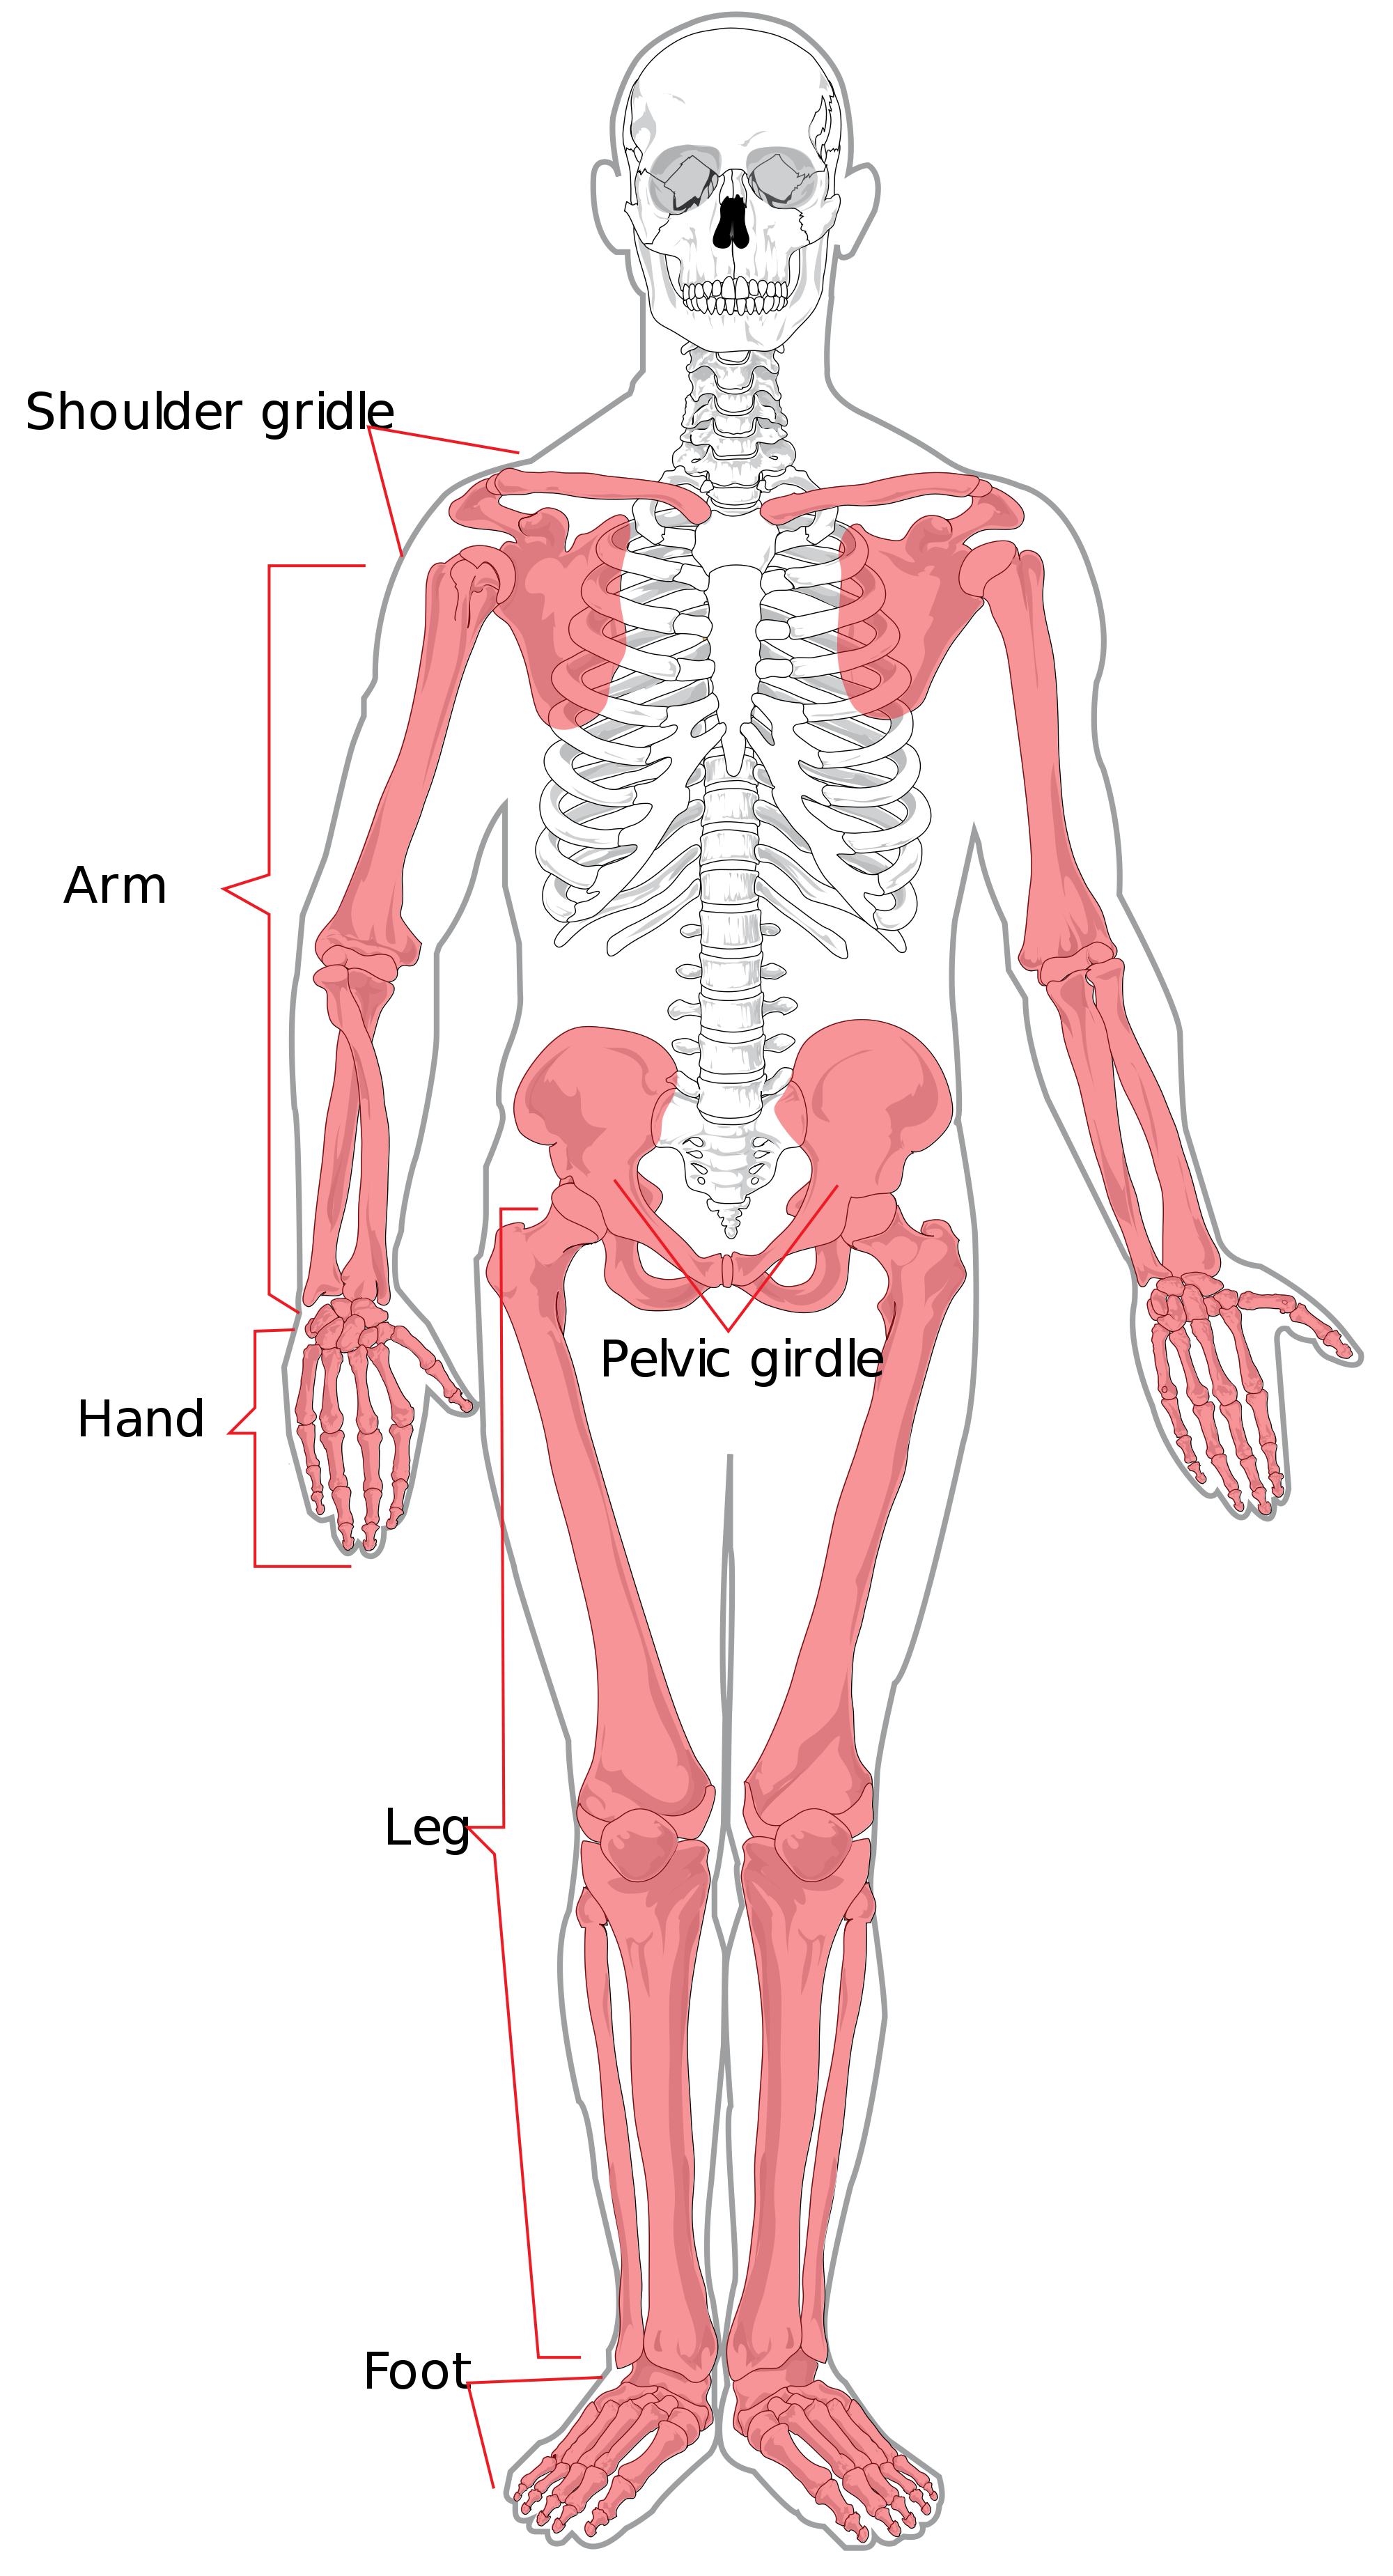 Human clipart anatomical body. File appendicular skeleton diagram